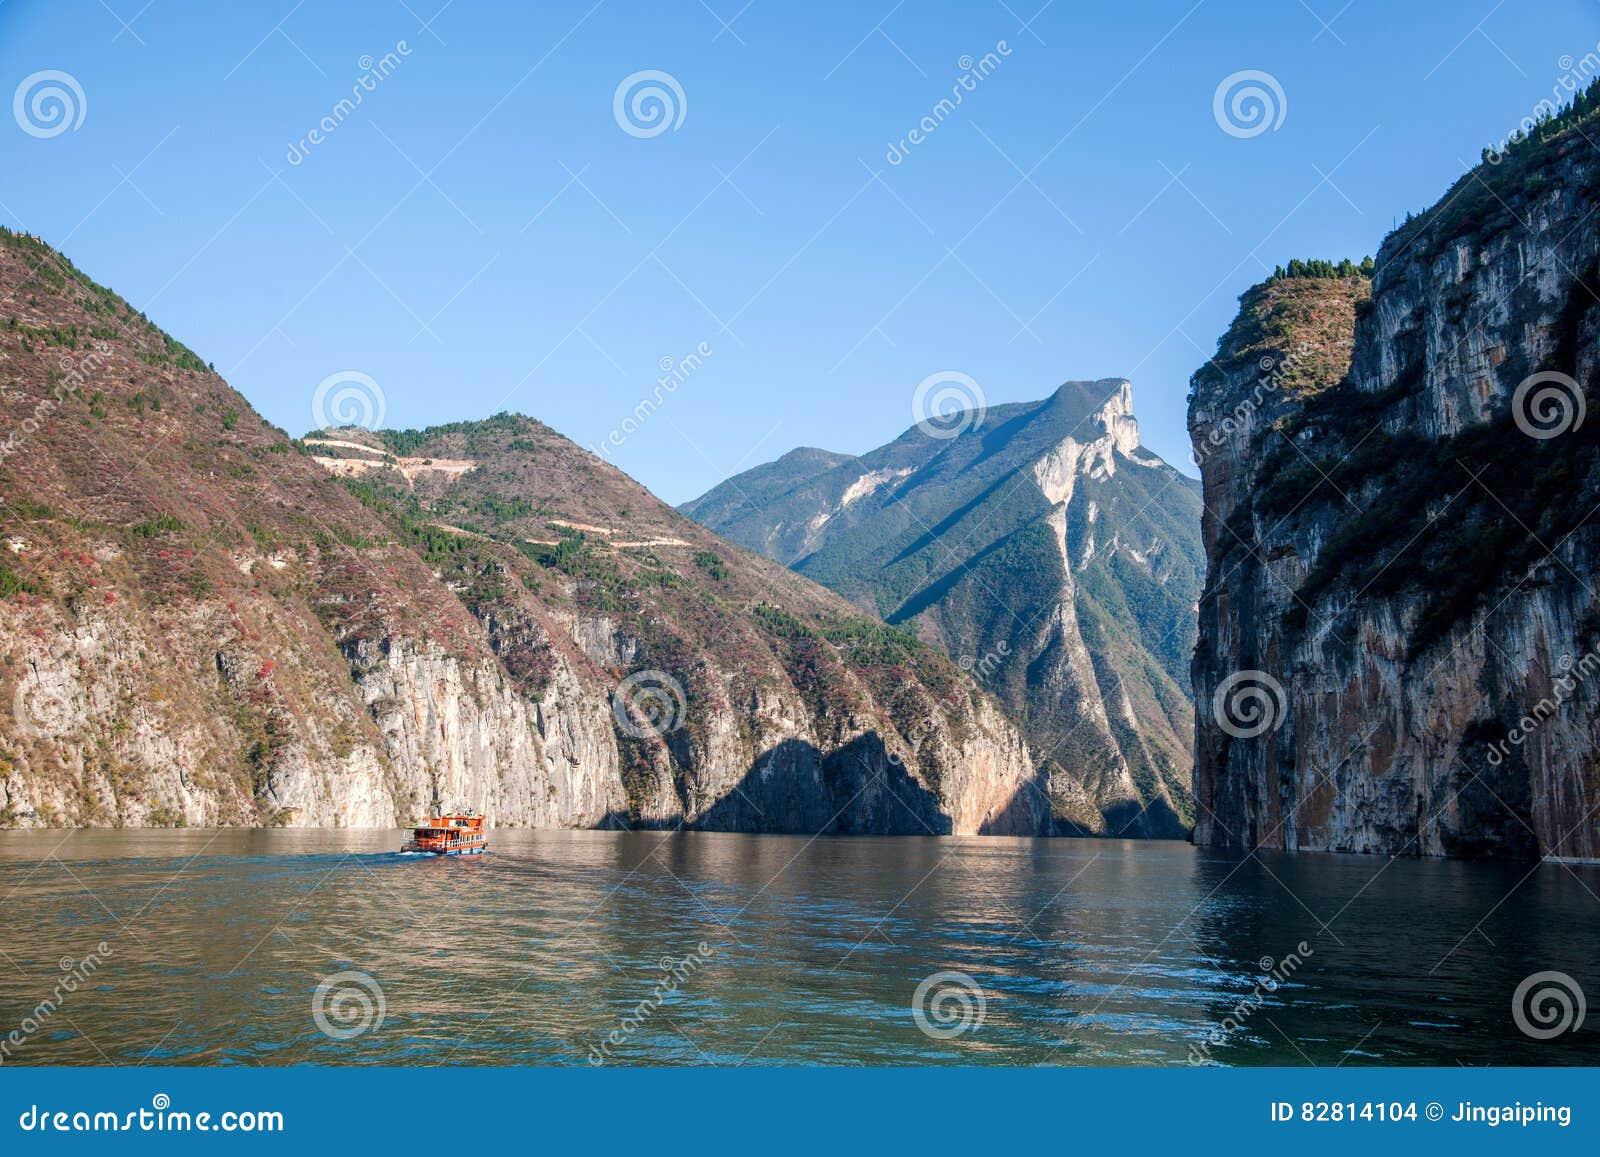 Three Gorges of the Yangtze River Qutangxia Gorge